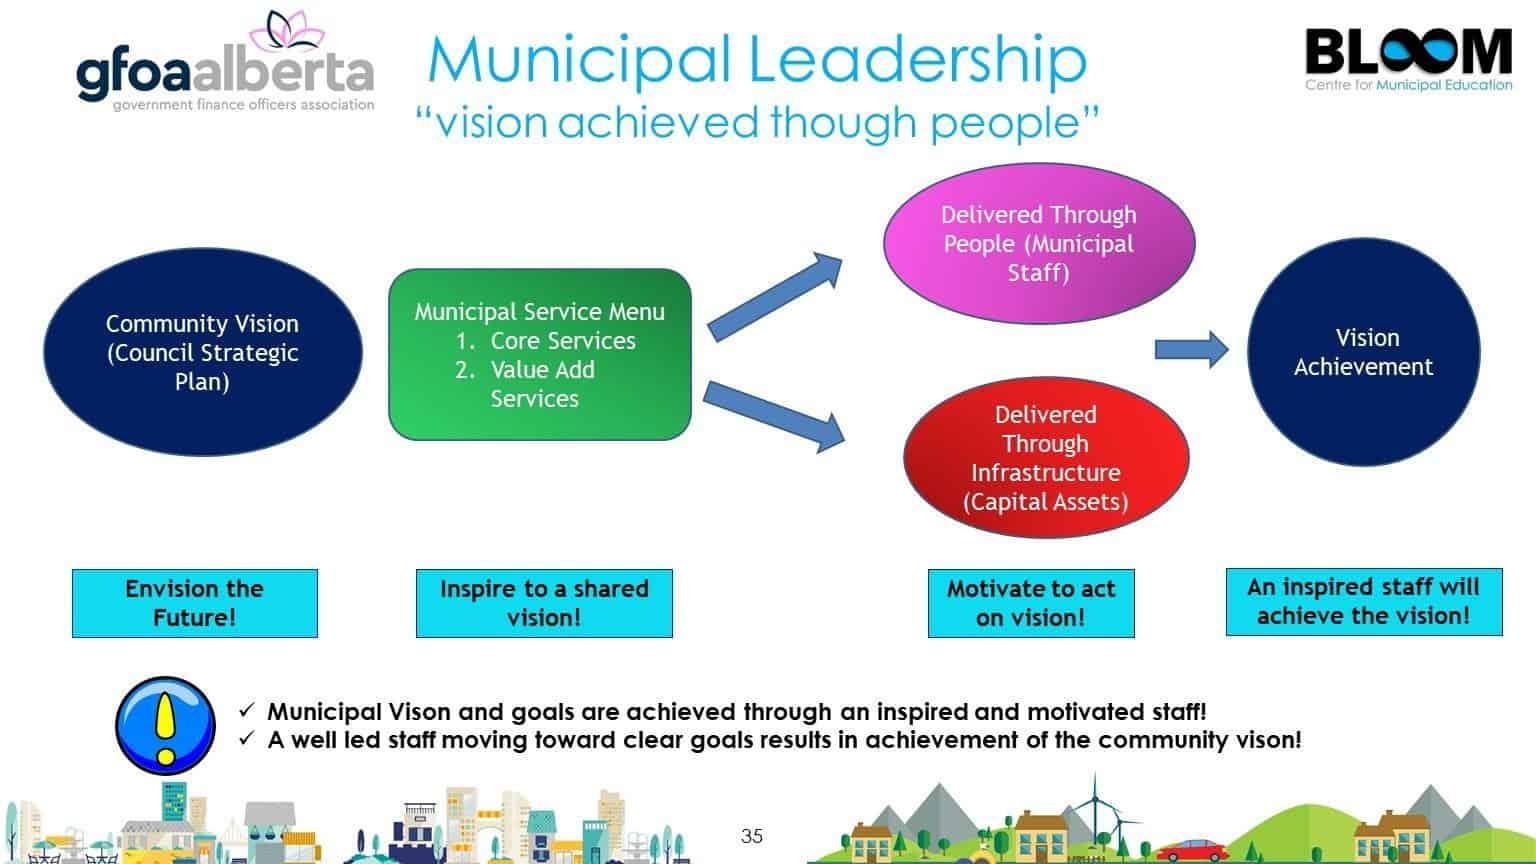 Municipal Leadership